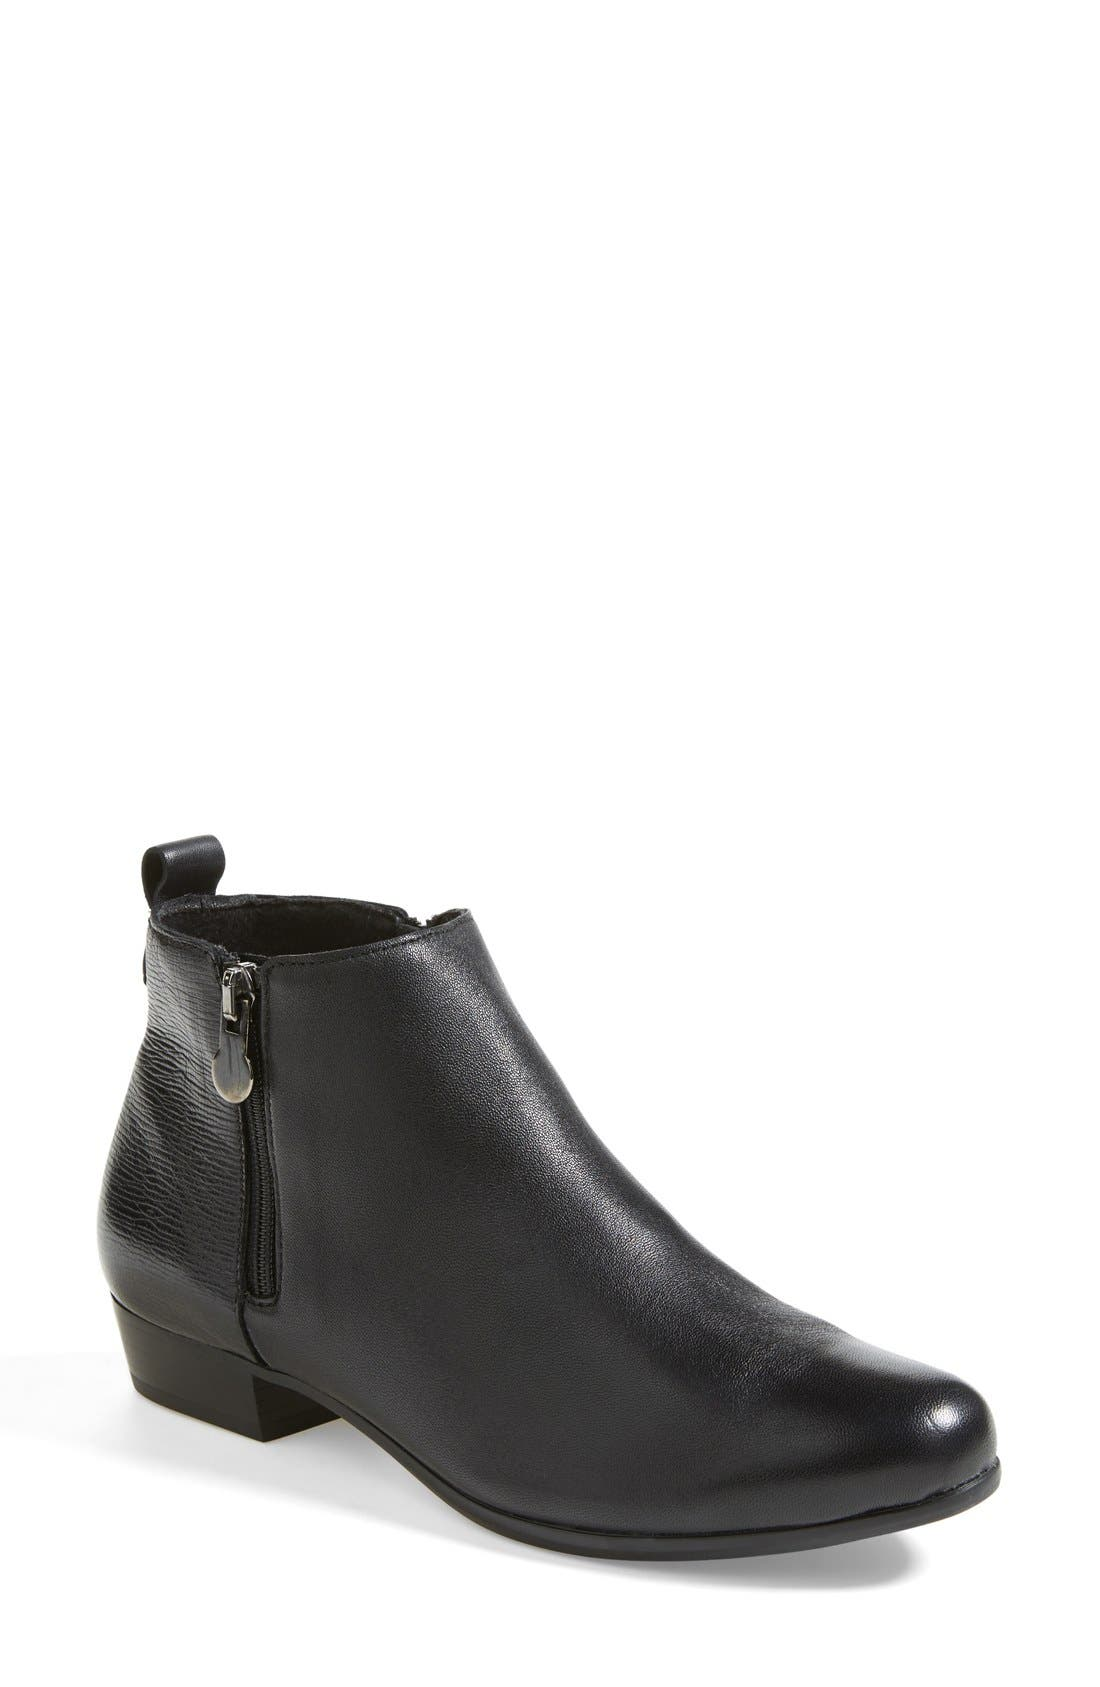 Alternate Image 1 Selected - Munro 'Lexi' Boot (Women)